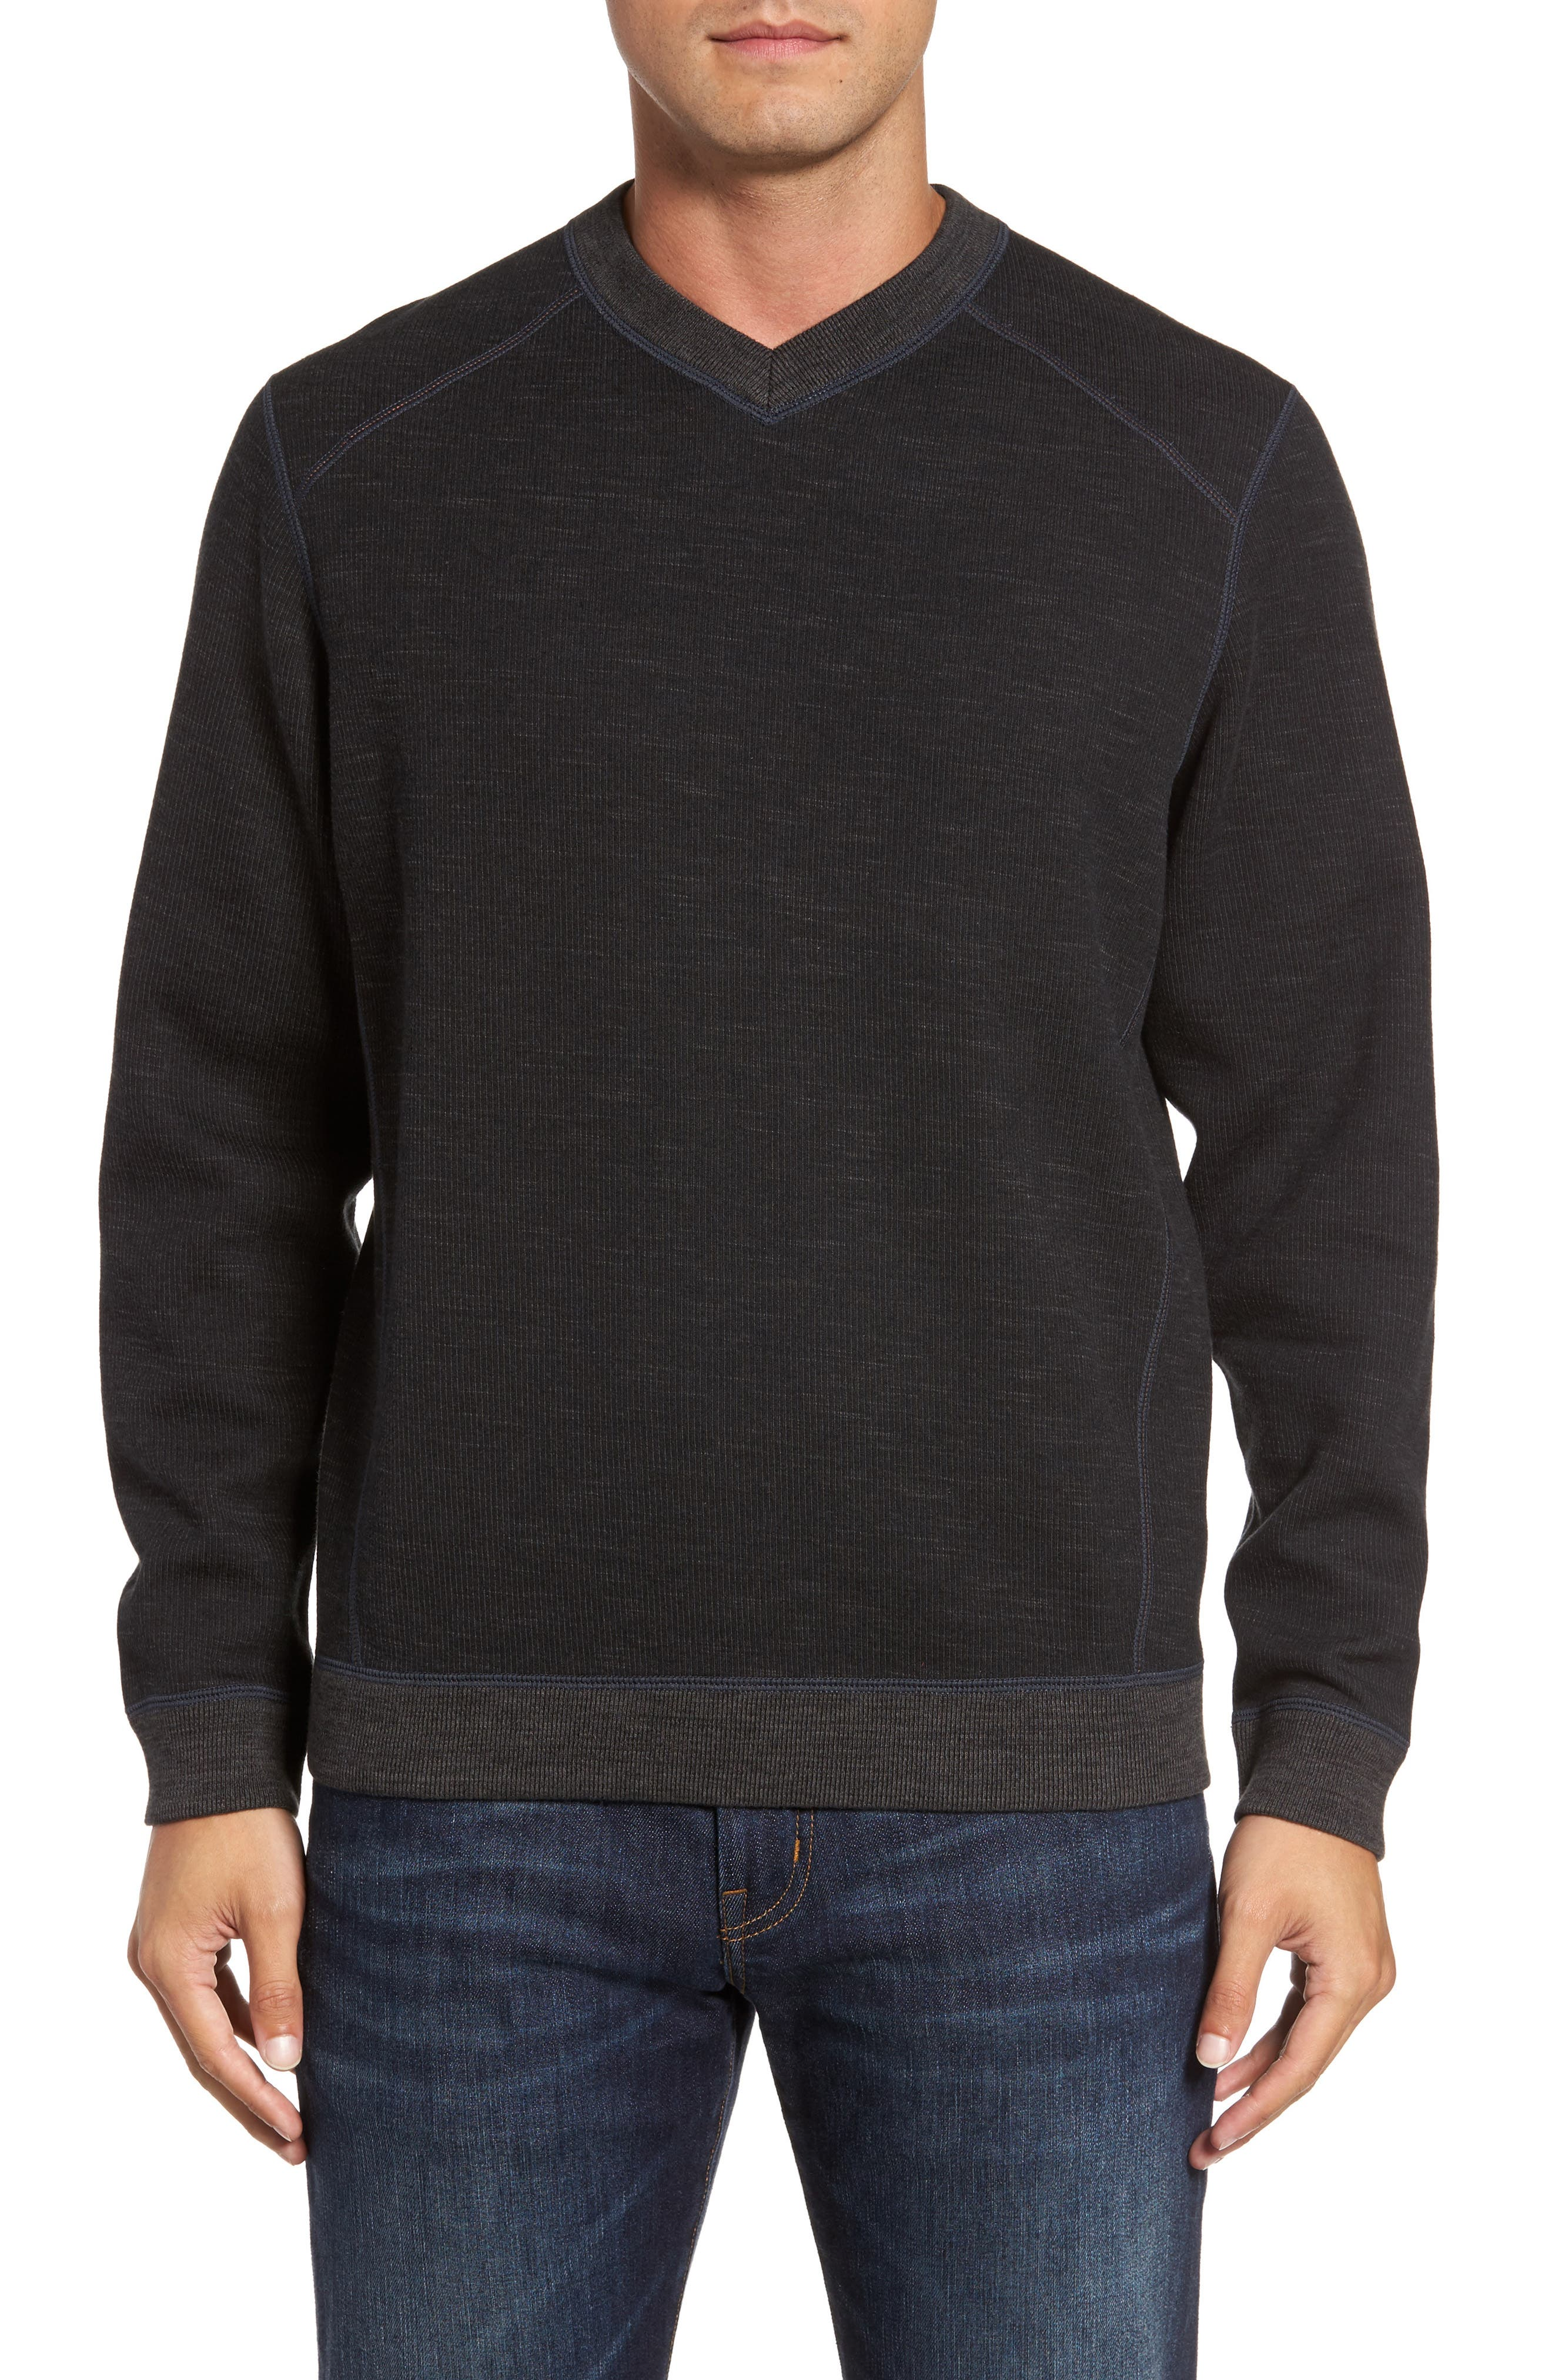 Flipside Pro Reversible Sweatshirt,                             Main thumbnail 1, color,                             001